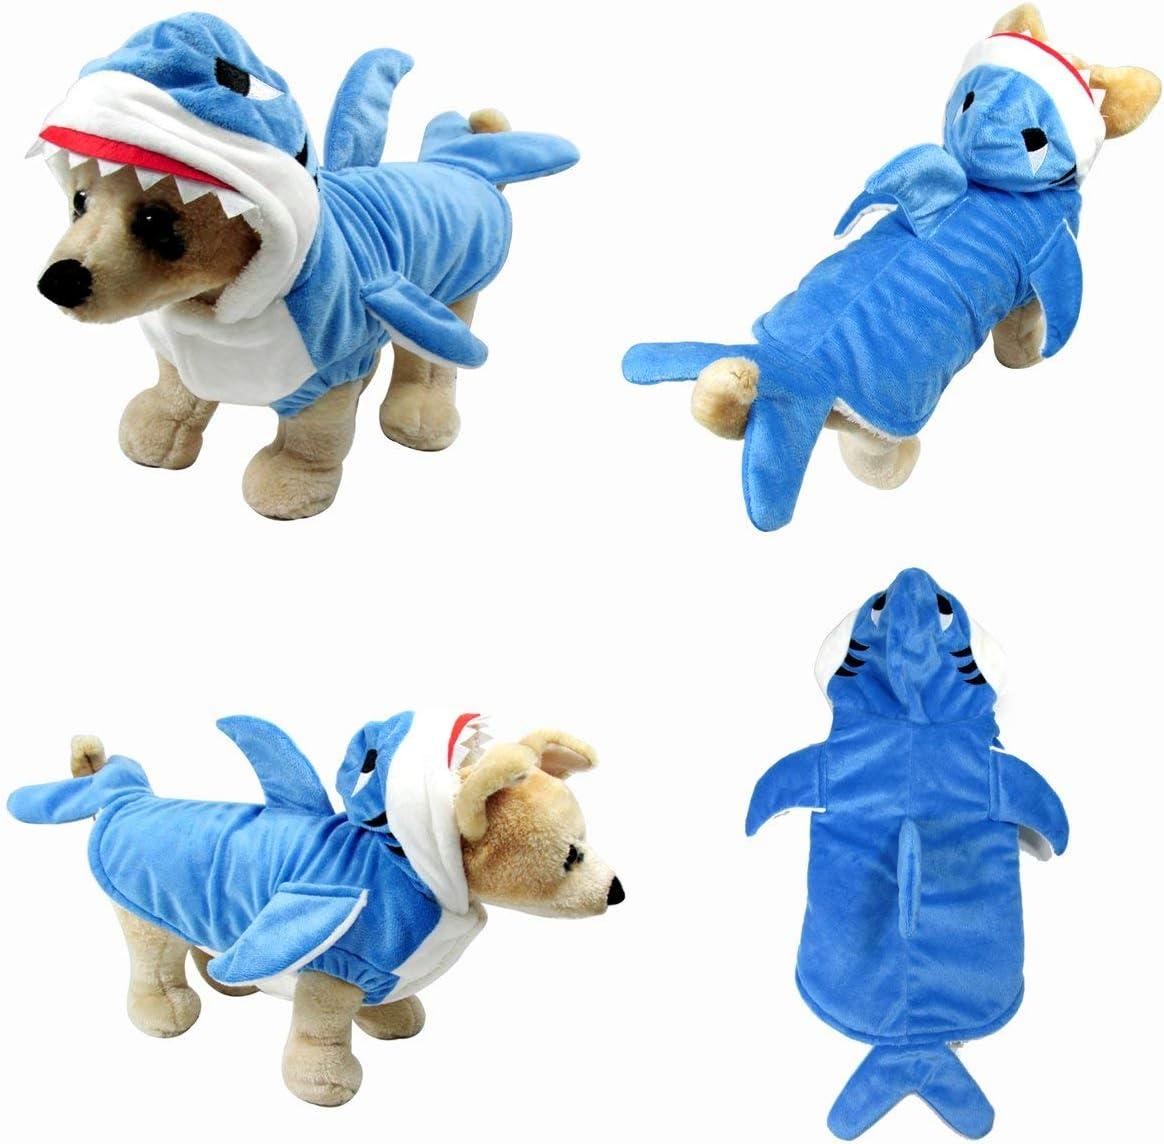 Yoption Puppy Dog Pet Halloween Costume Outwear Coat Apparel Hoodie